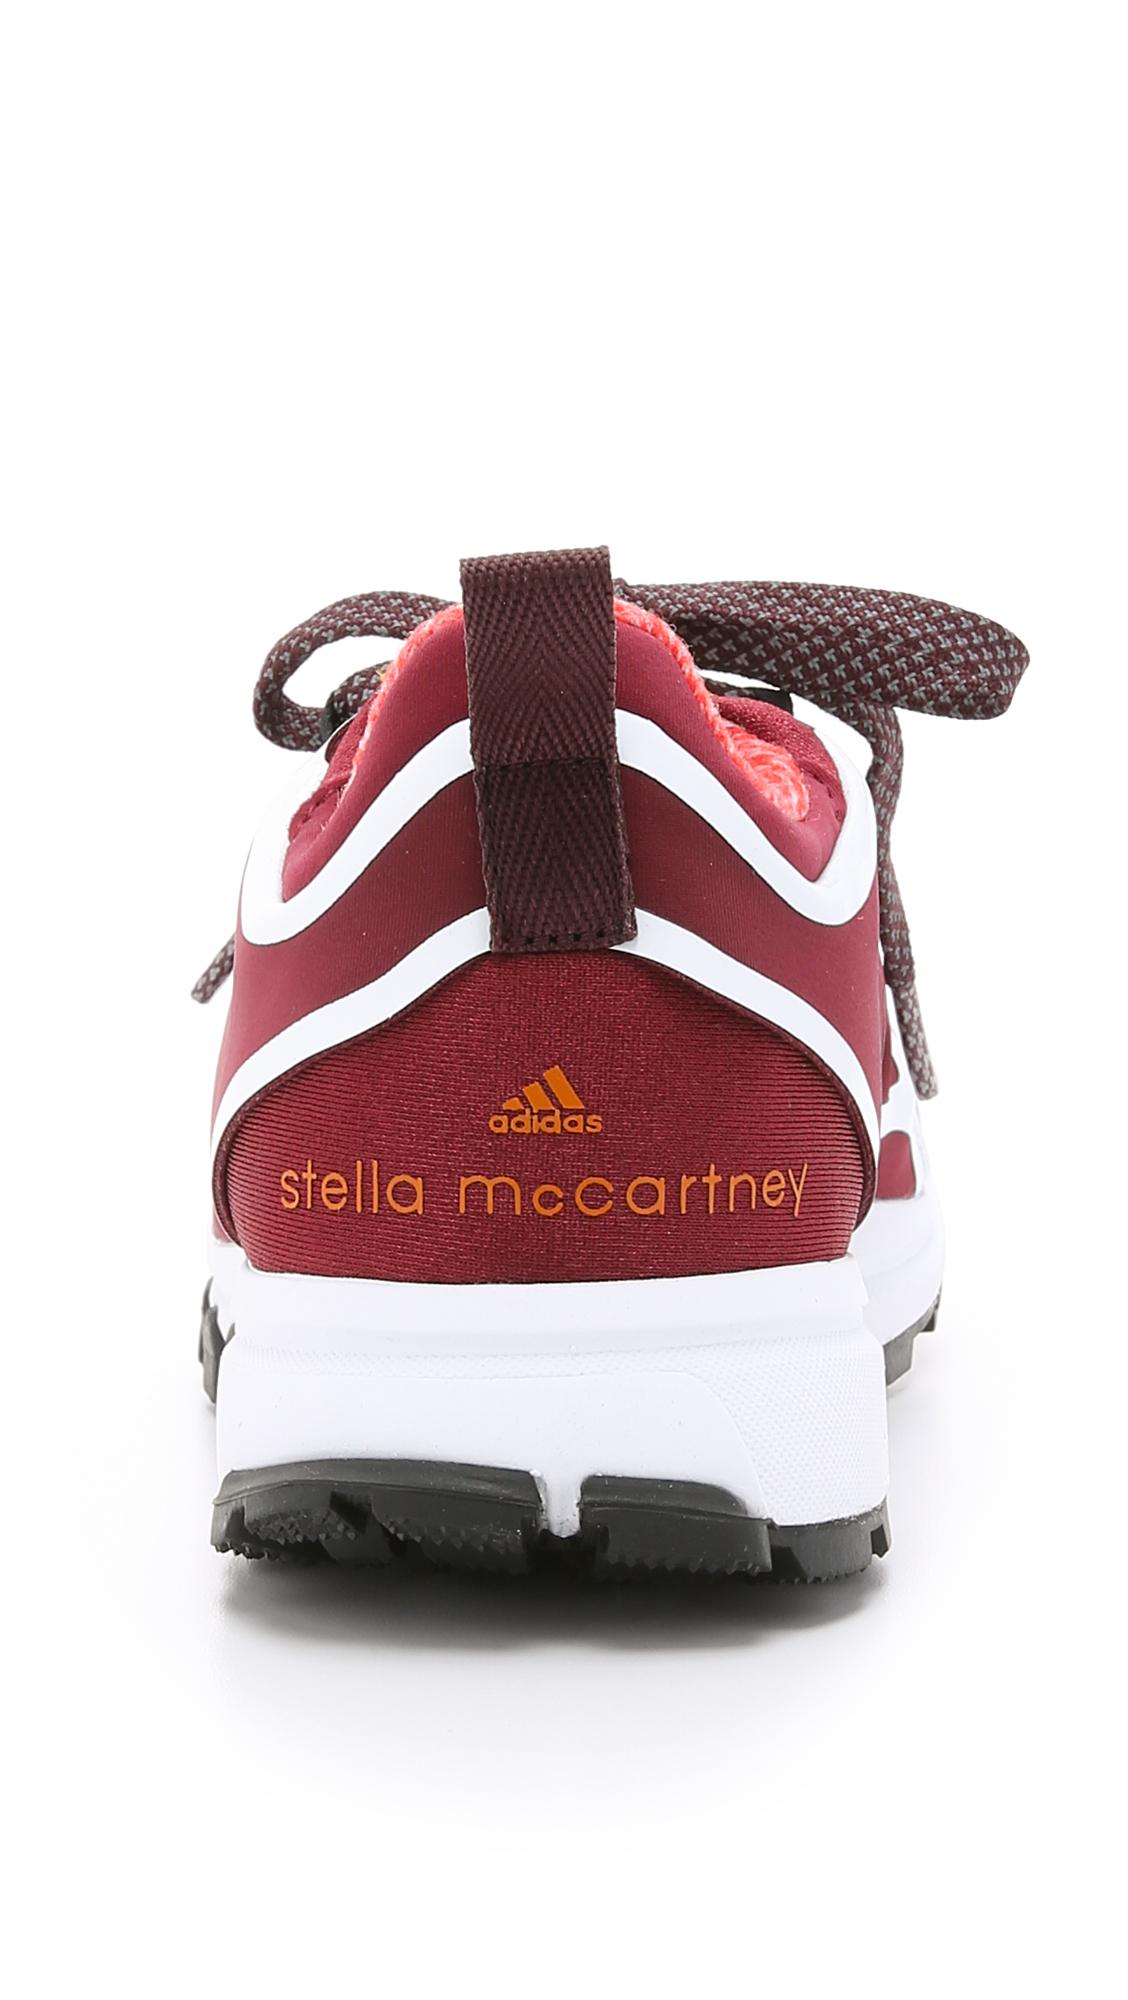 adidas By Stella McCartney Adizero Xt Sneakers - Dark Wine ... c64850882